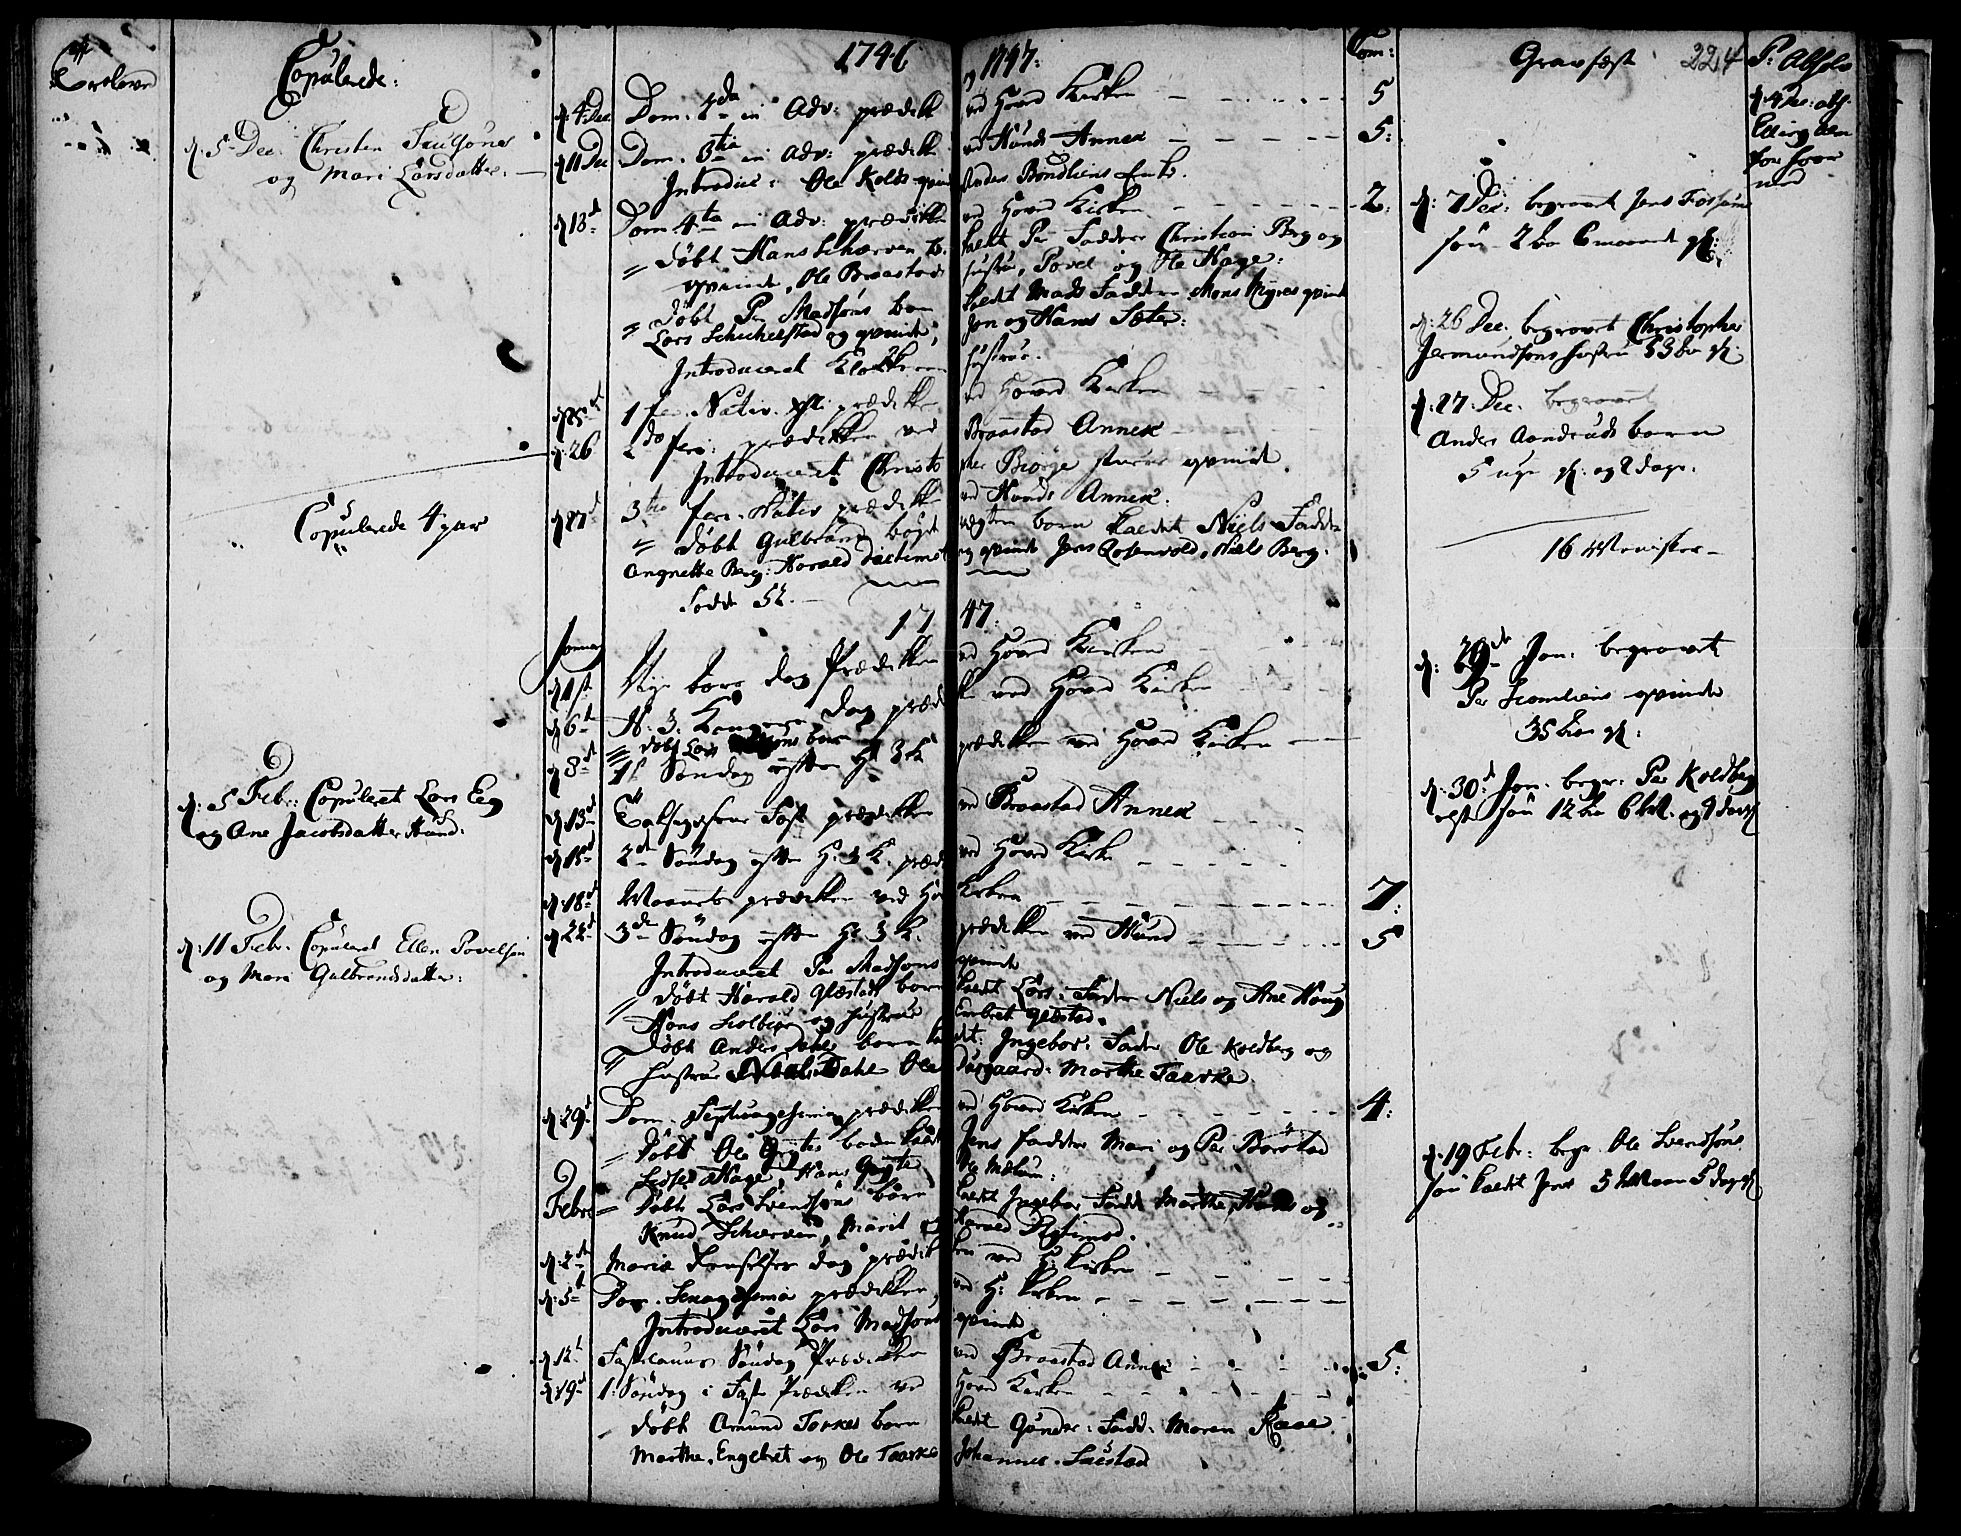 SAH, Vardal prestekontor, H/Ha/Haa/L0001: Ministerialbok nr. 1, 1706-1748, s. 224